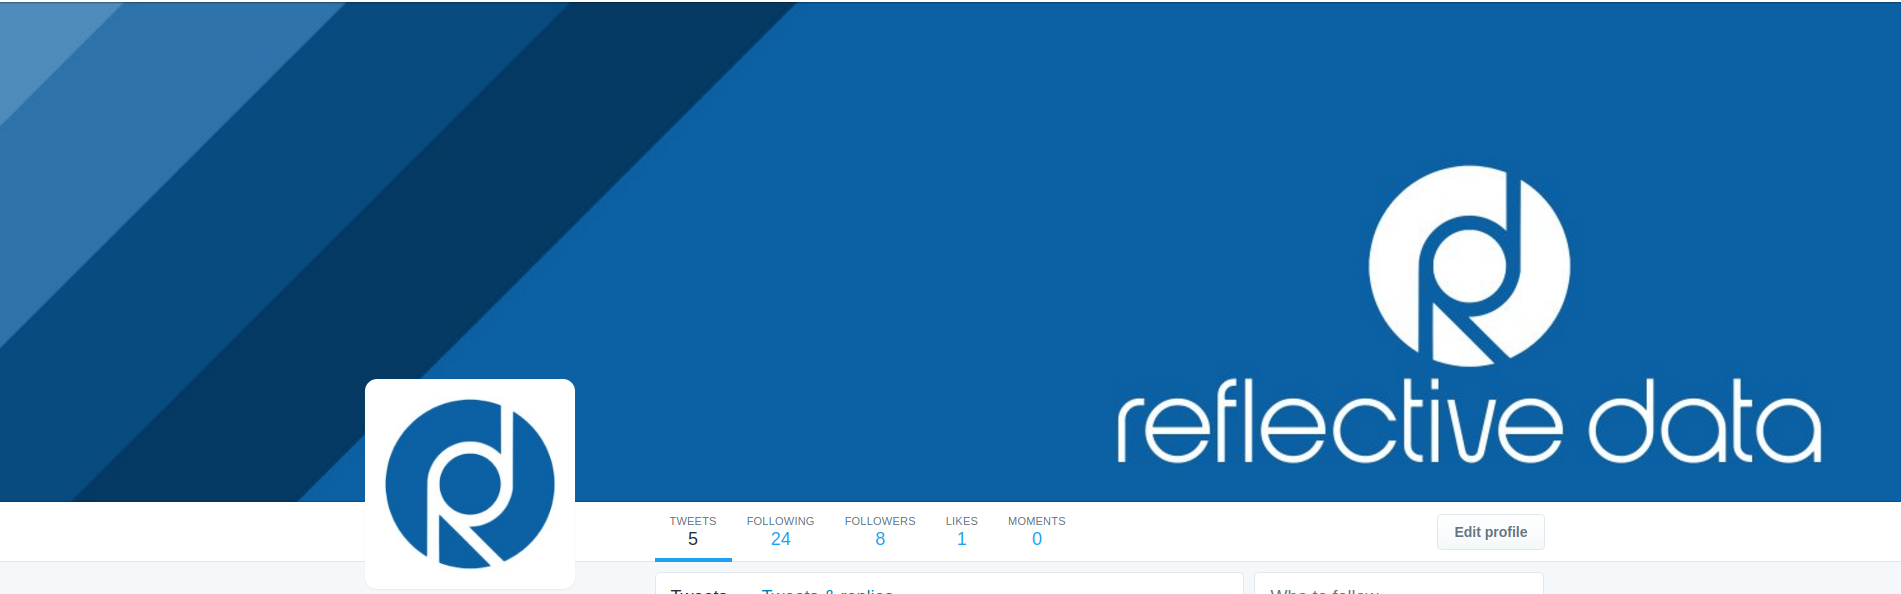 Reflective Data Twitter Account